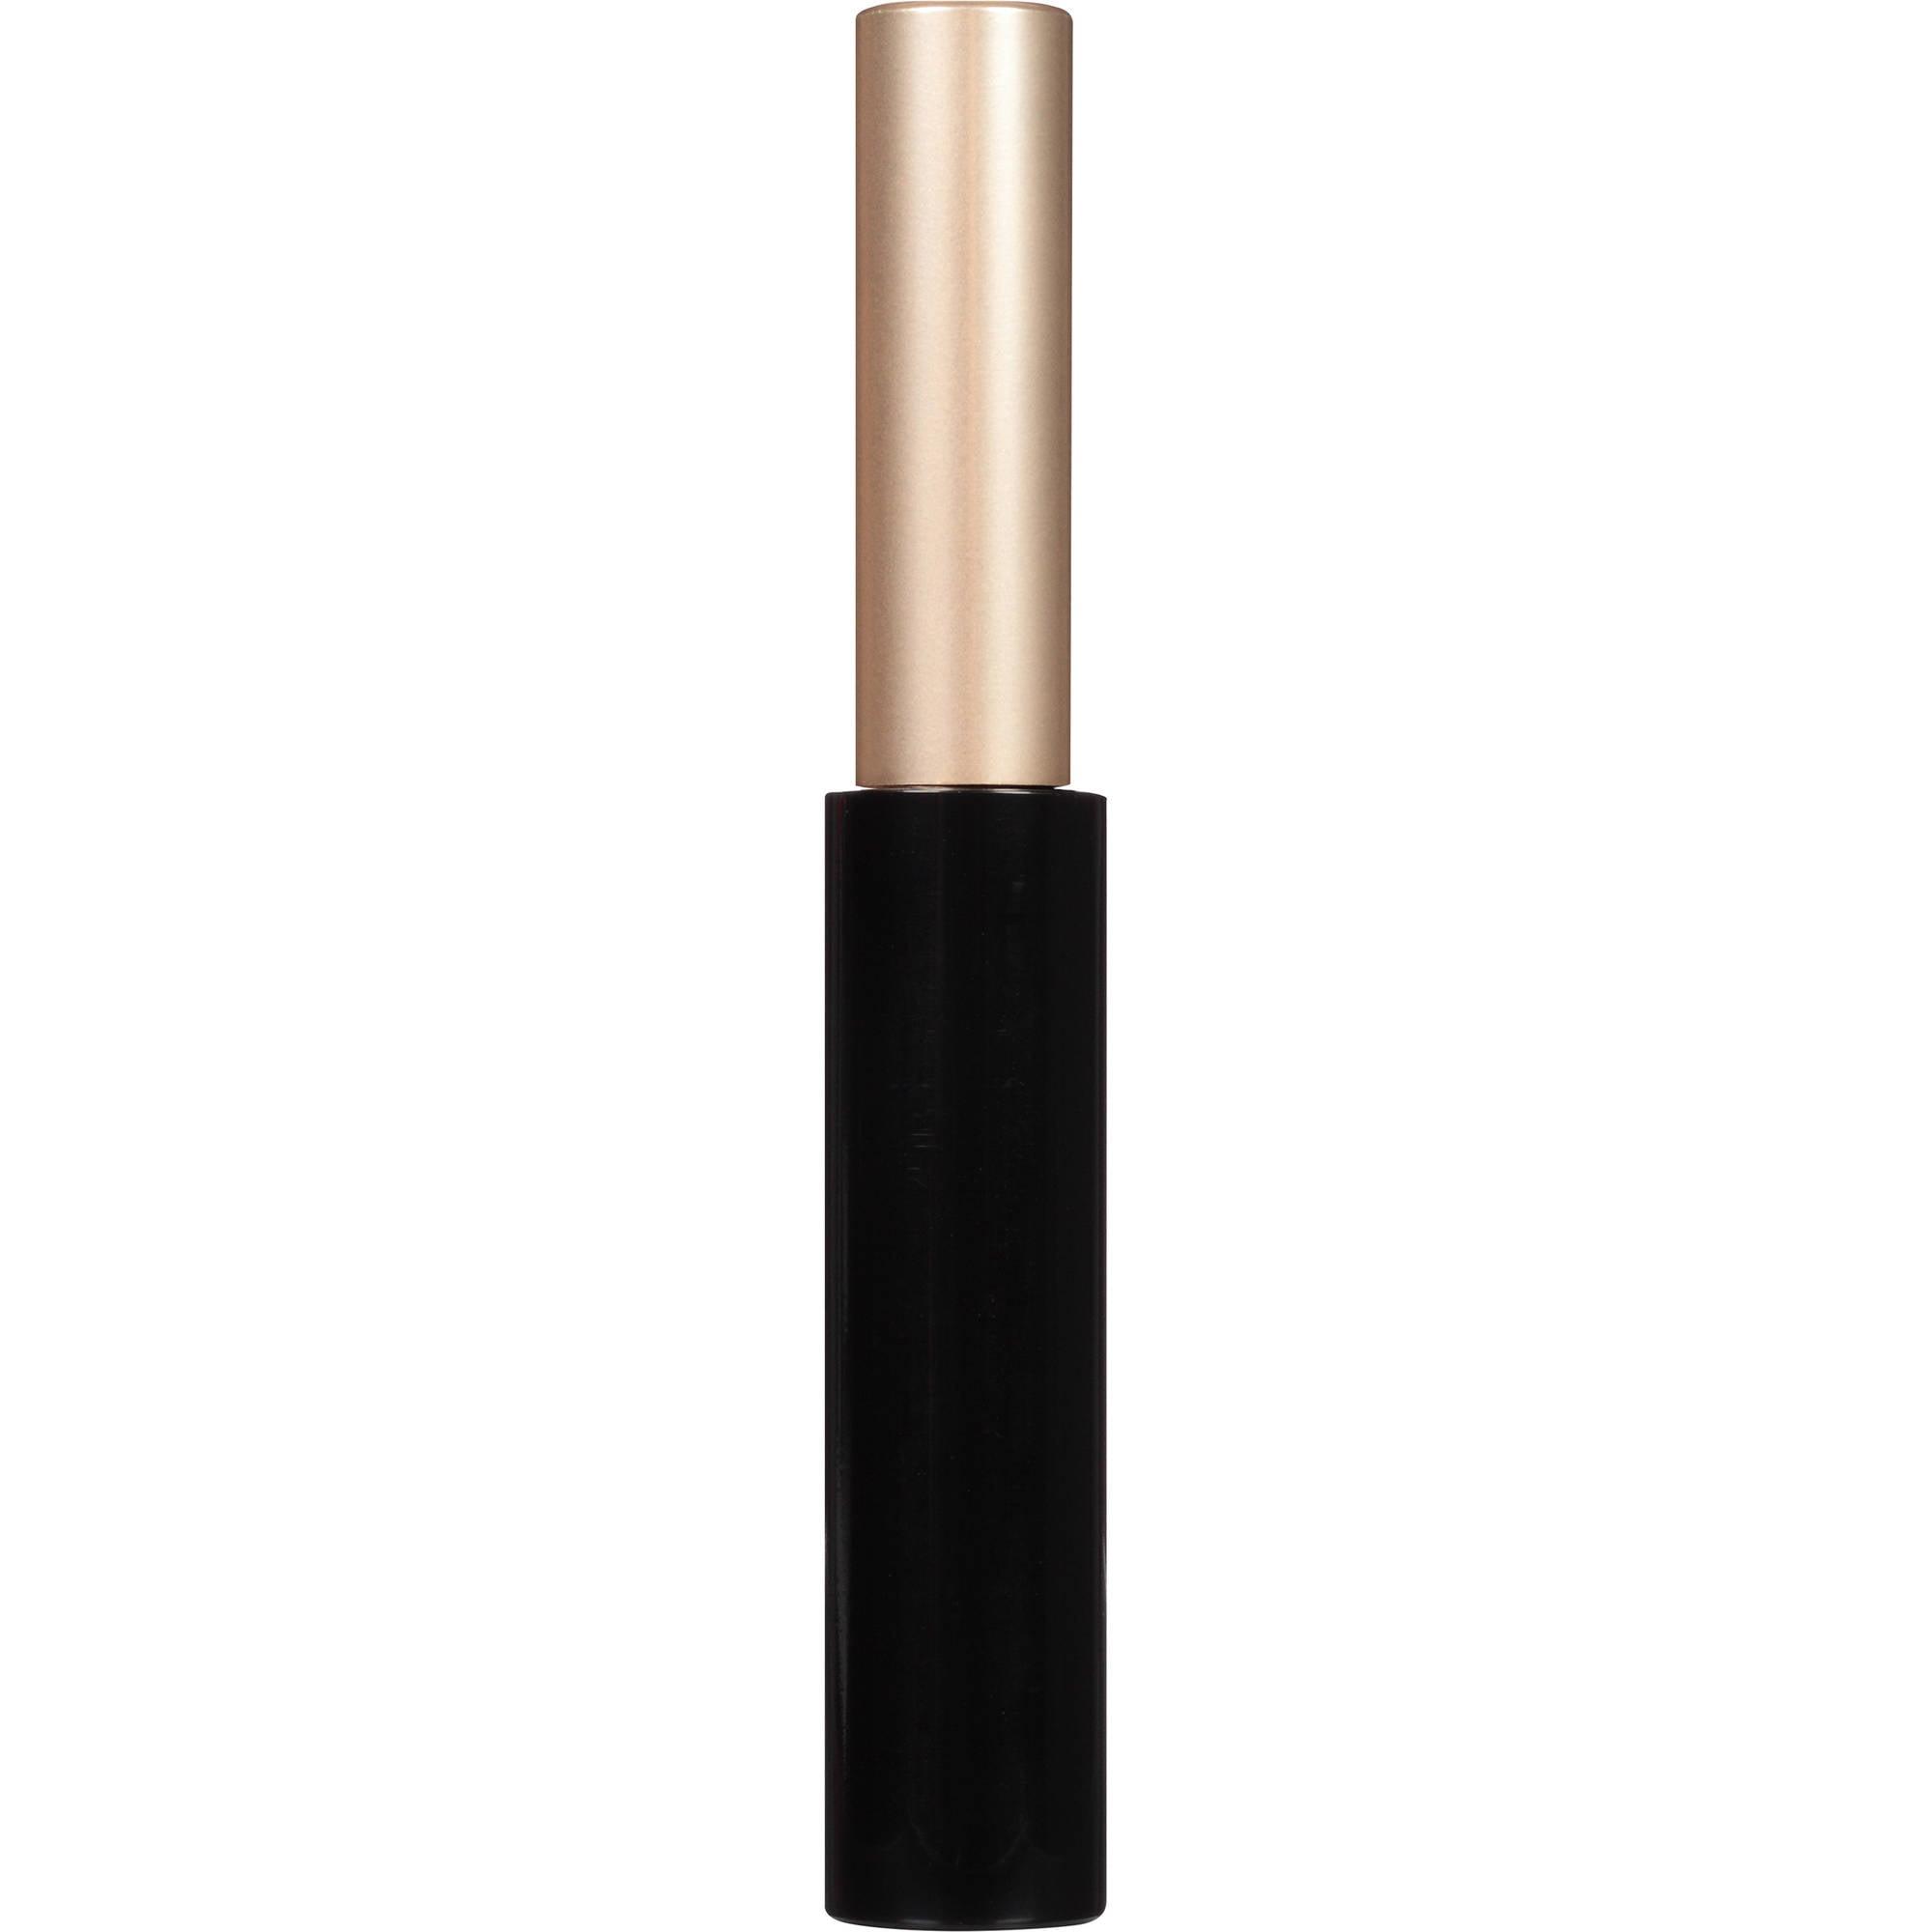 L'Oreal® Paris Lineur Intense Brush Tip Liquid Eyeliner ...